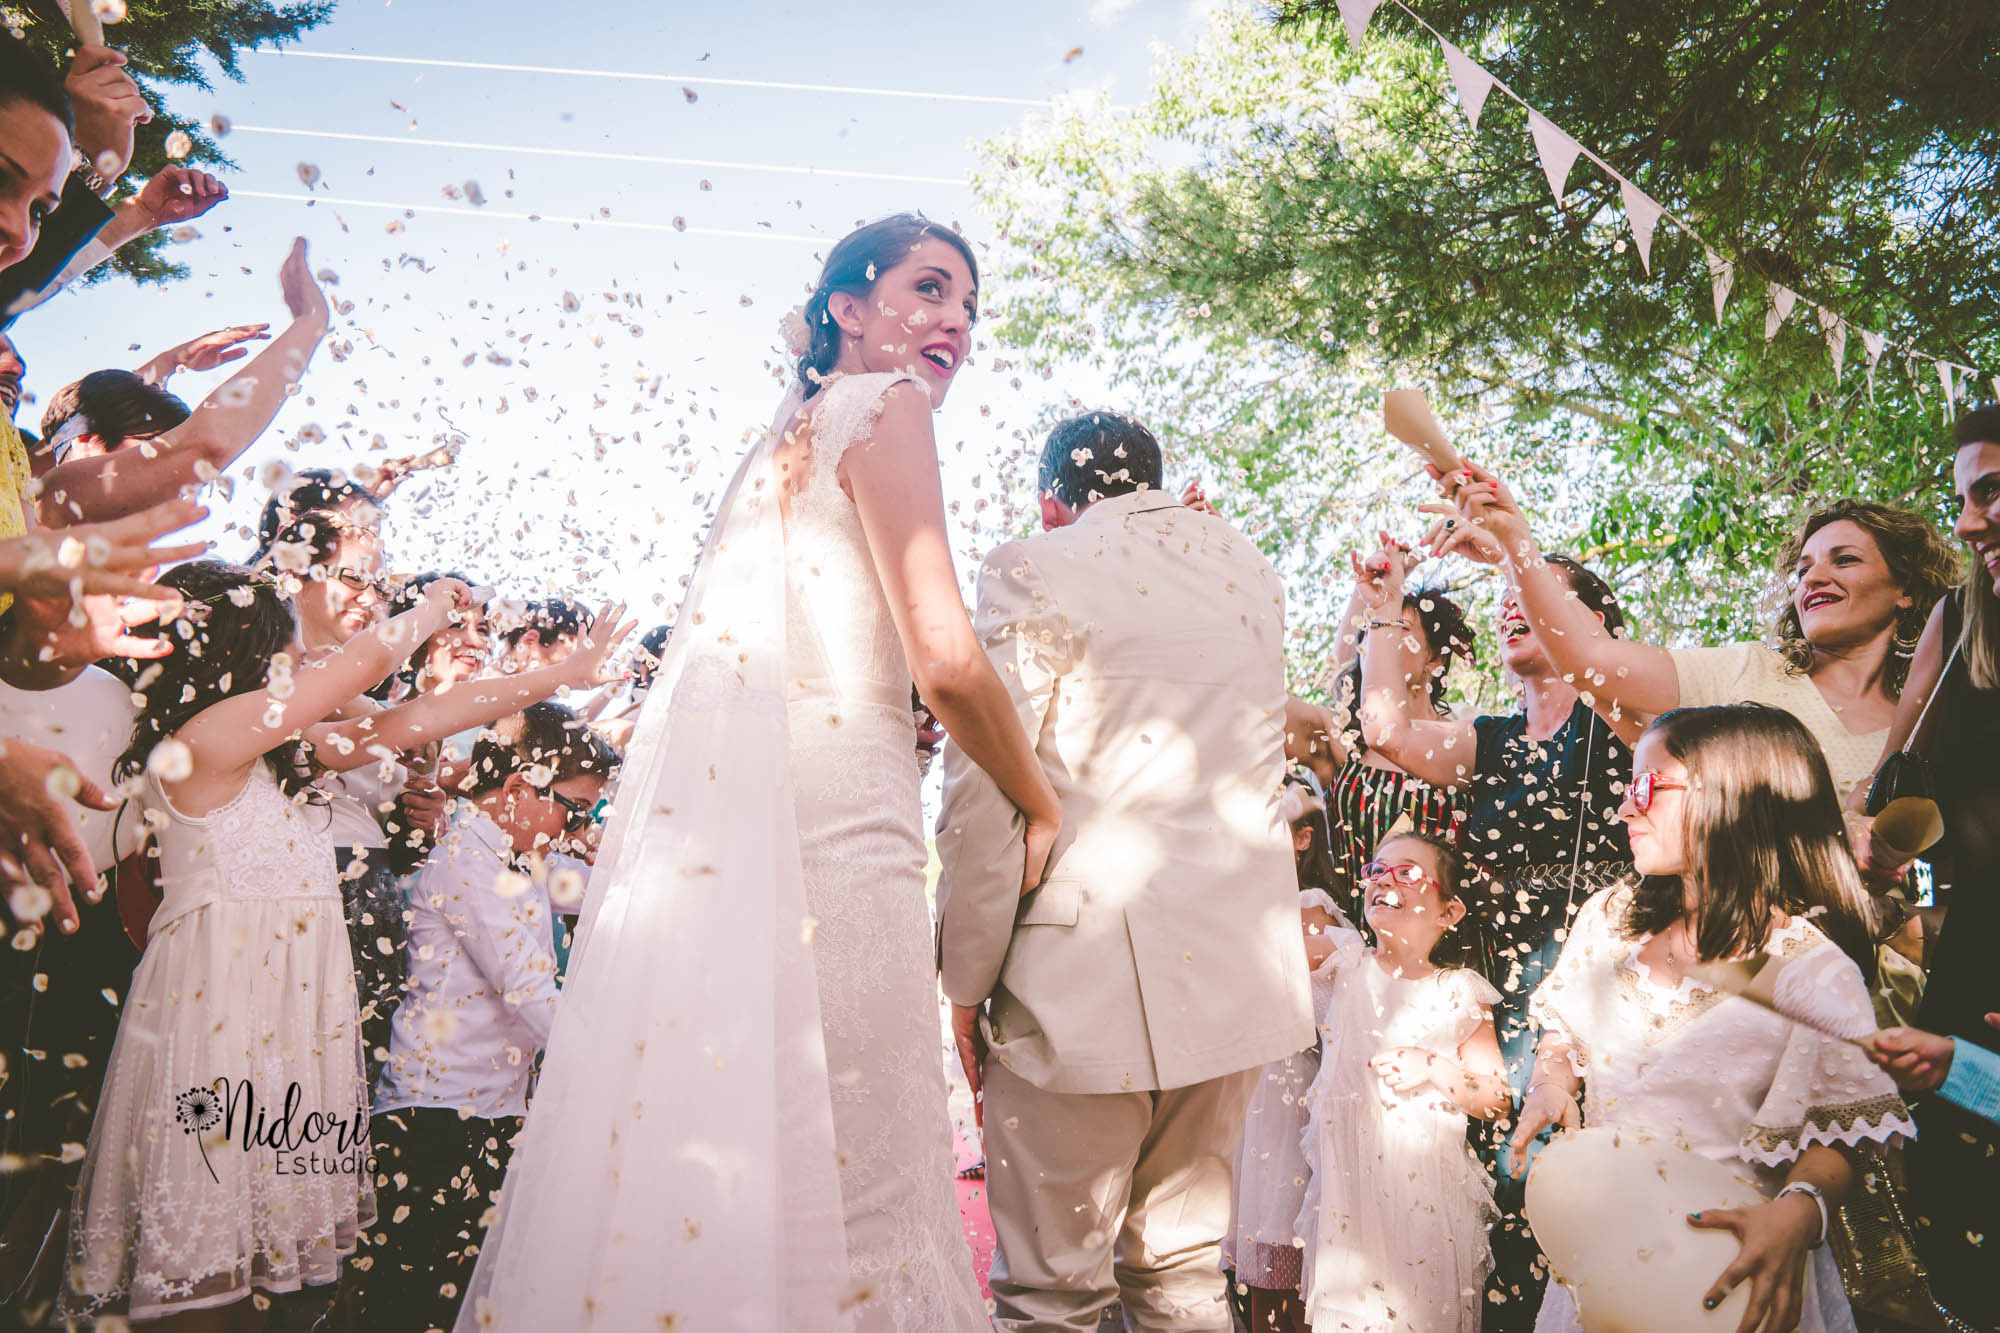 fotos-de-boda-reportaje-novios-fotografia-boda-nidoriestudio-fotos-valencia-almazora-castellon-españa-spain-015